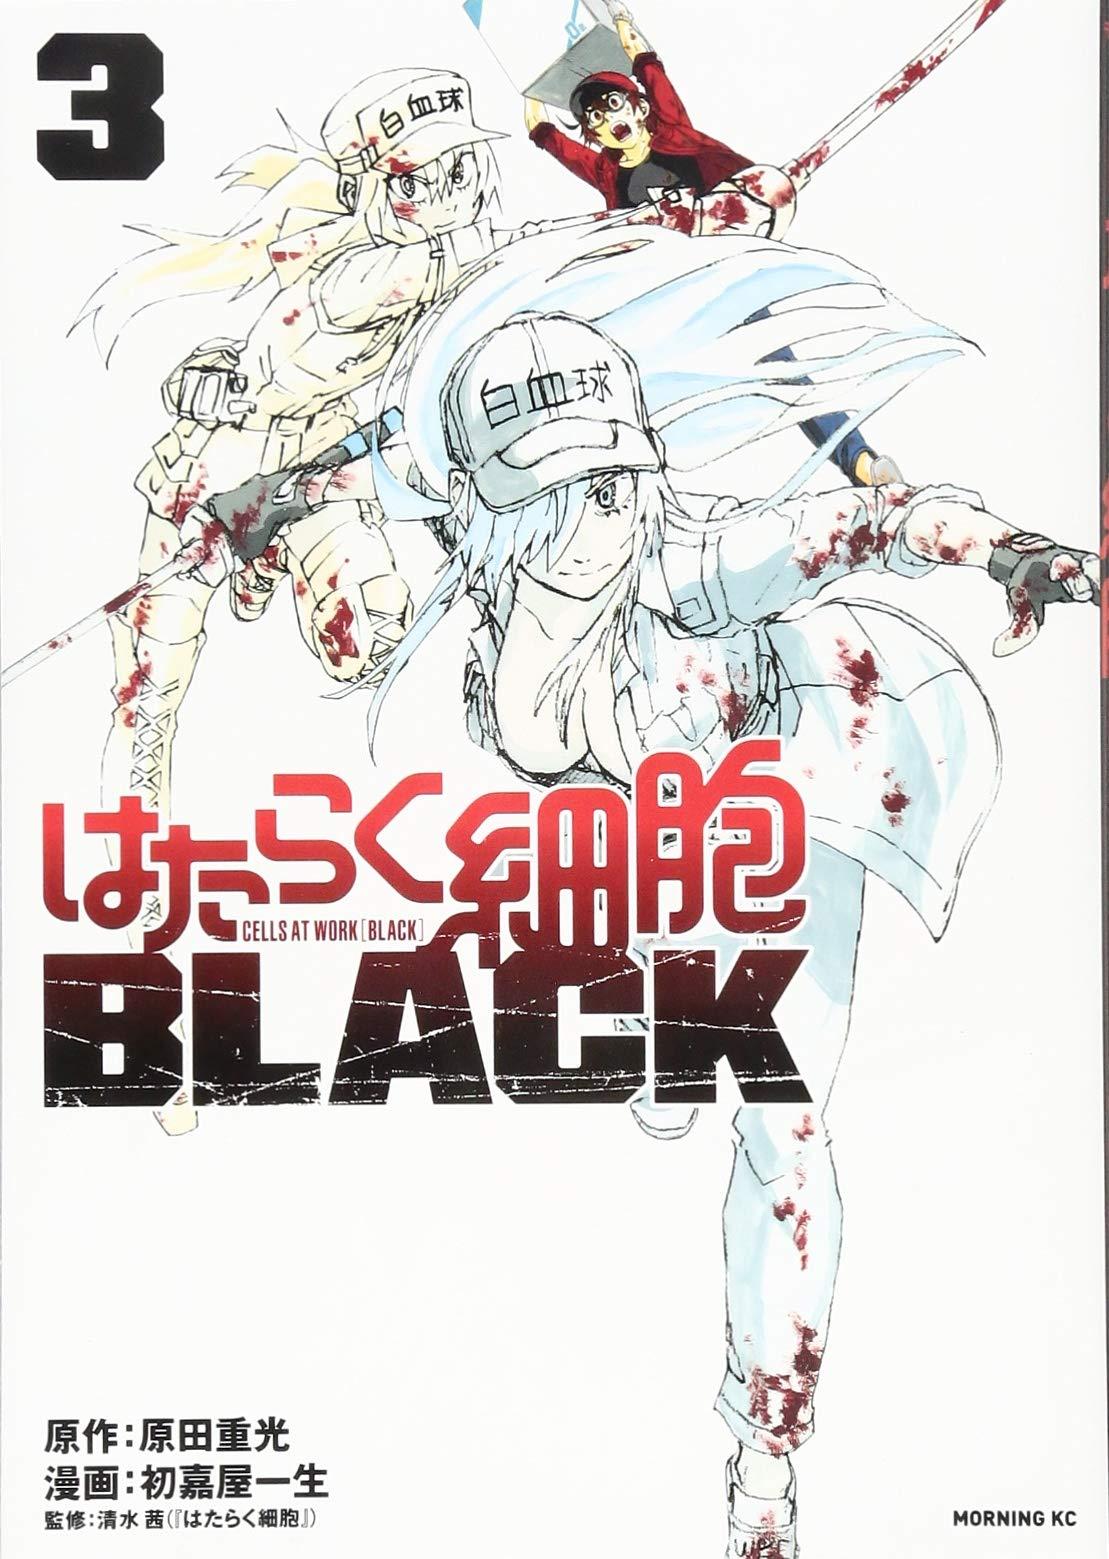 Black はたらく 細胞